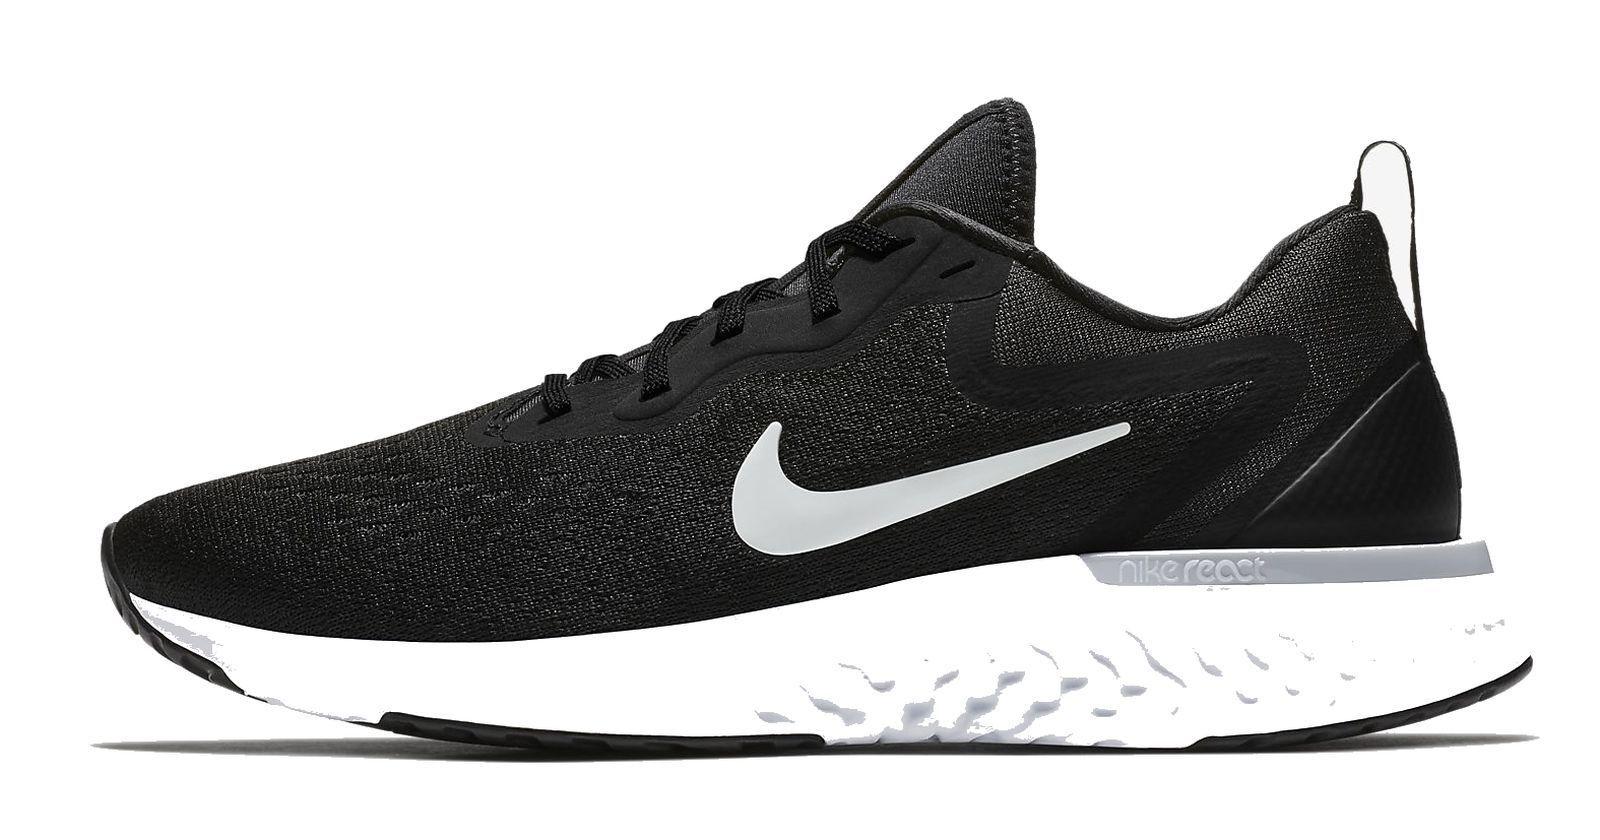 Nike señora mentecato wmns wmns wmns nike Nike odyssey react W blancoo negro 535c02